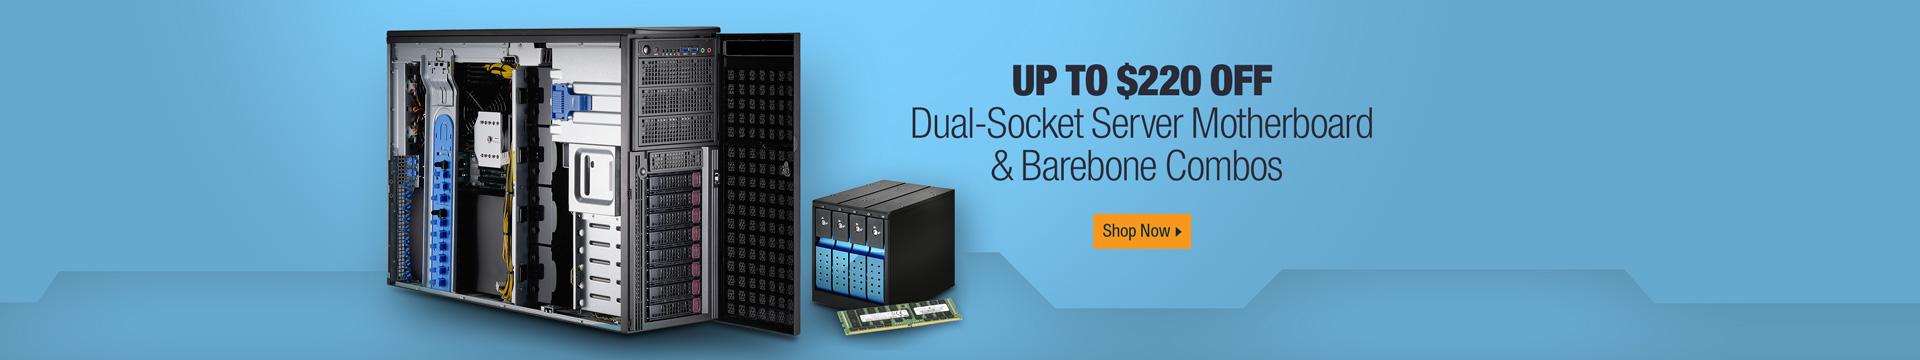 Server Racks, Cabinets, Mounts and More - Newegg com